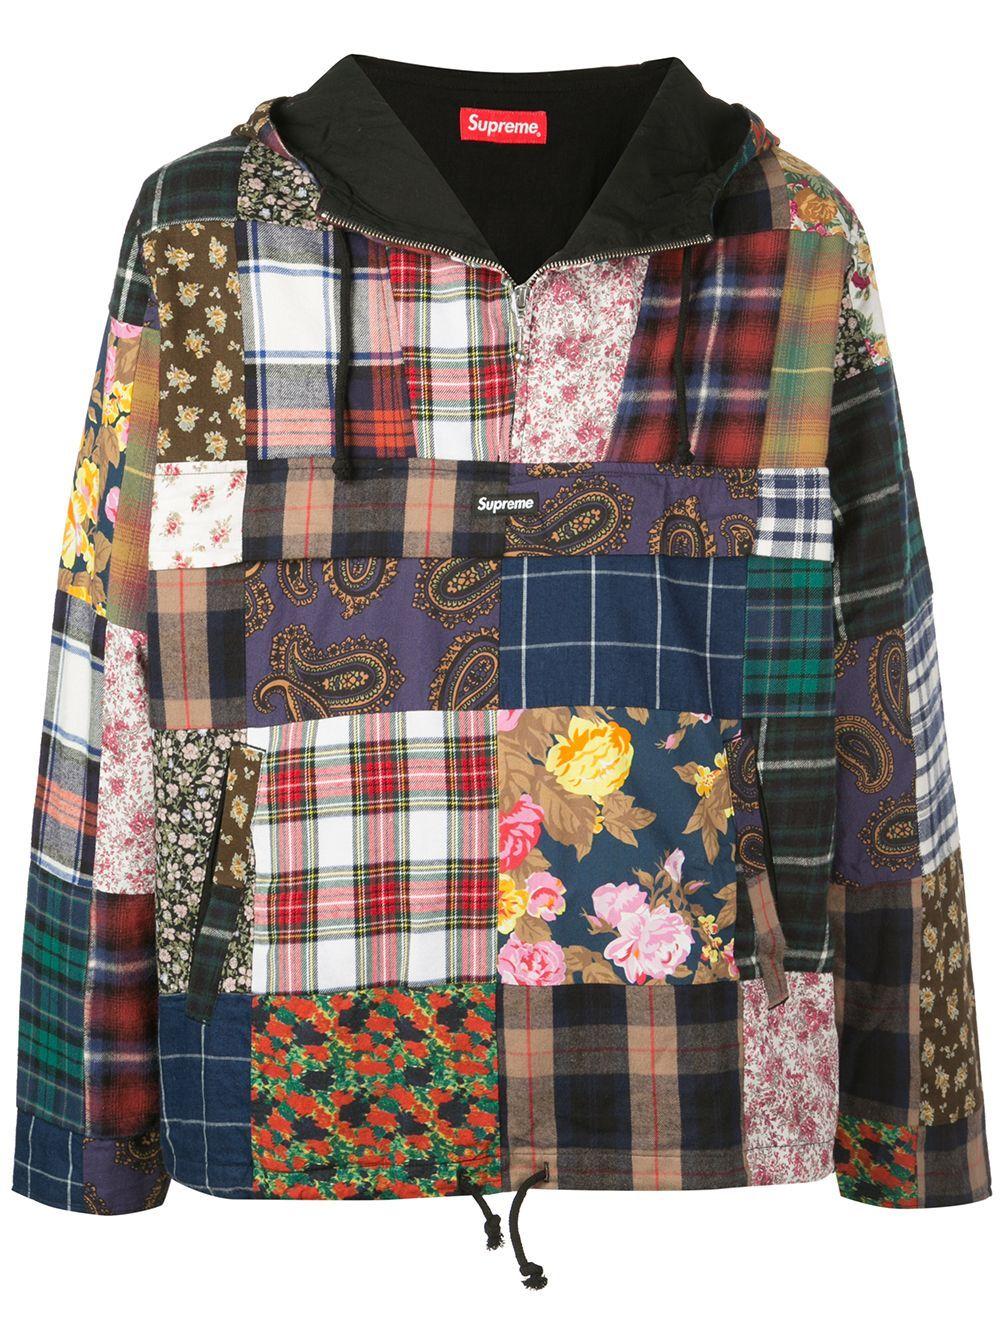 Supreme Patchwork Anorak Jacket Farfetch Anorak Jacket Patchwork Clothes Quilted Clothes [ 1334 x 1000 Pixel ]